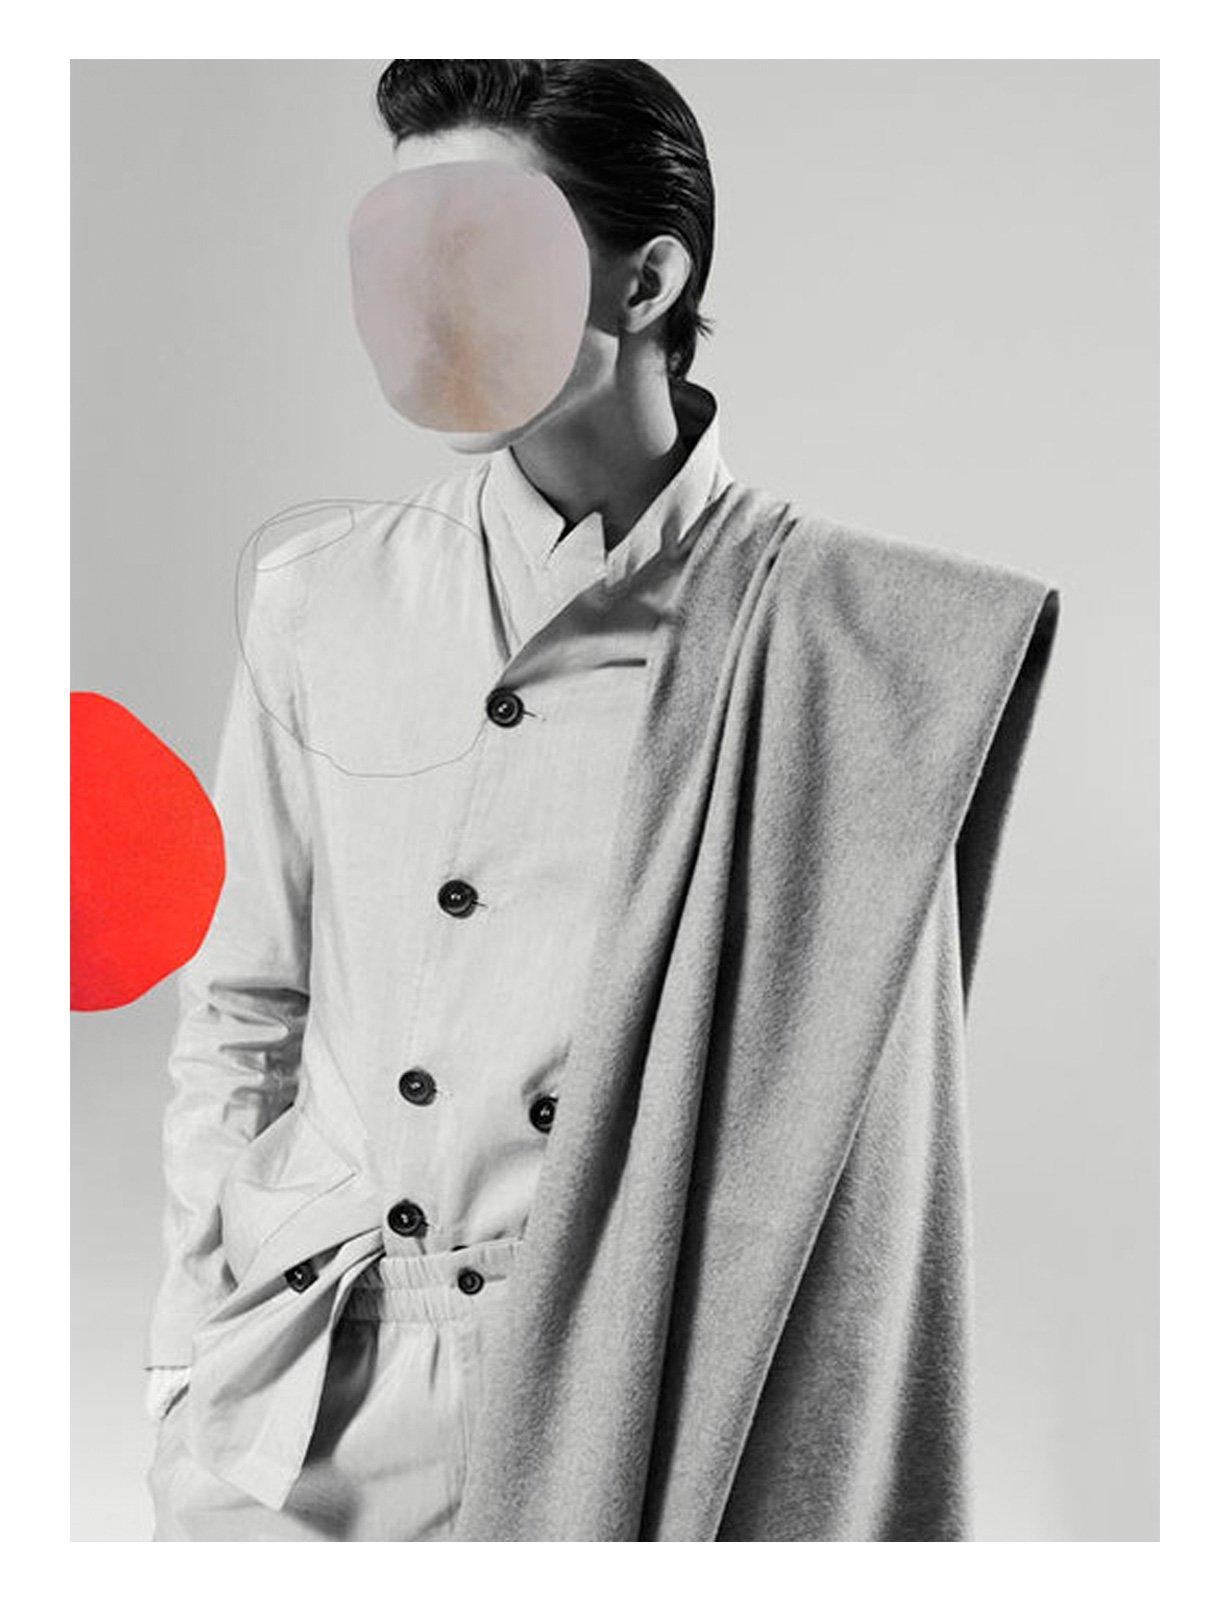 ignant-photo-lea-nielsen-fashion-photography-09